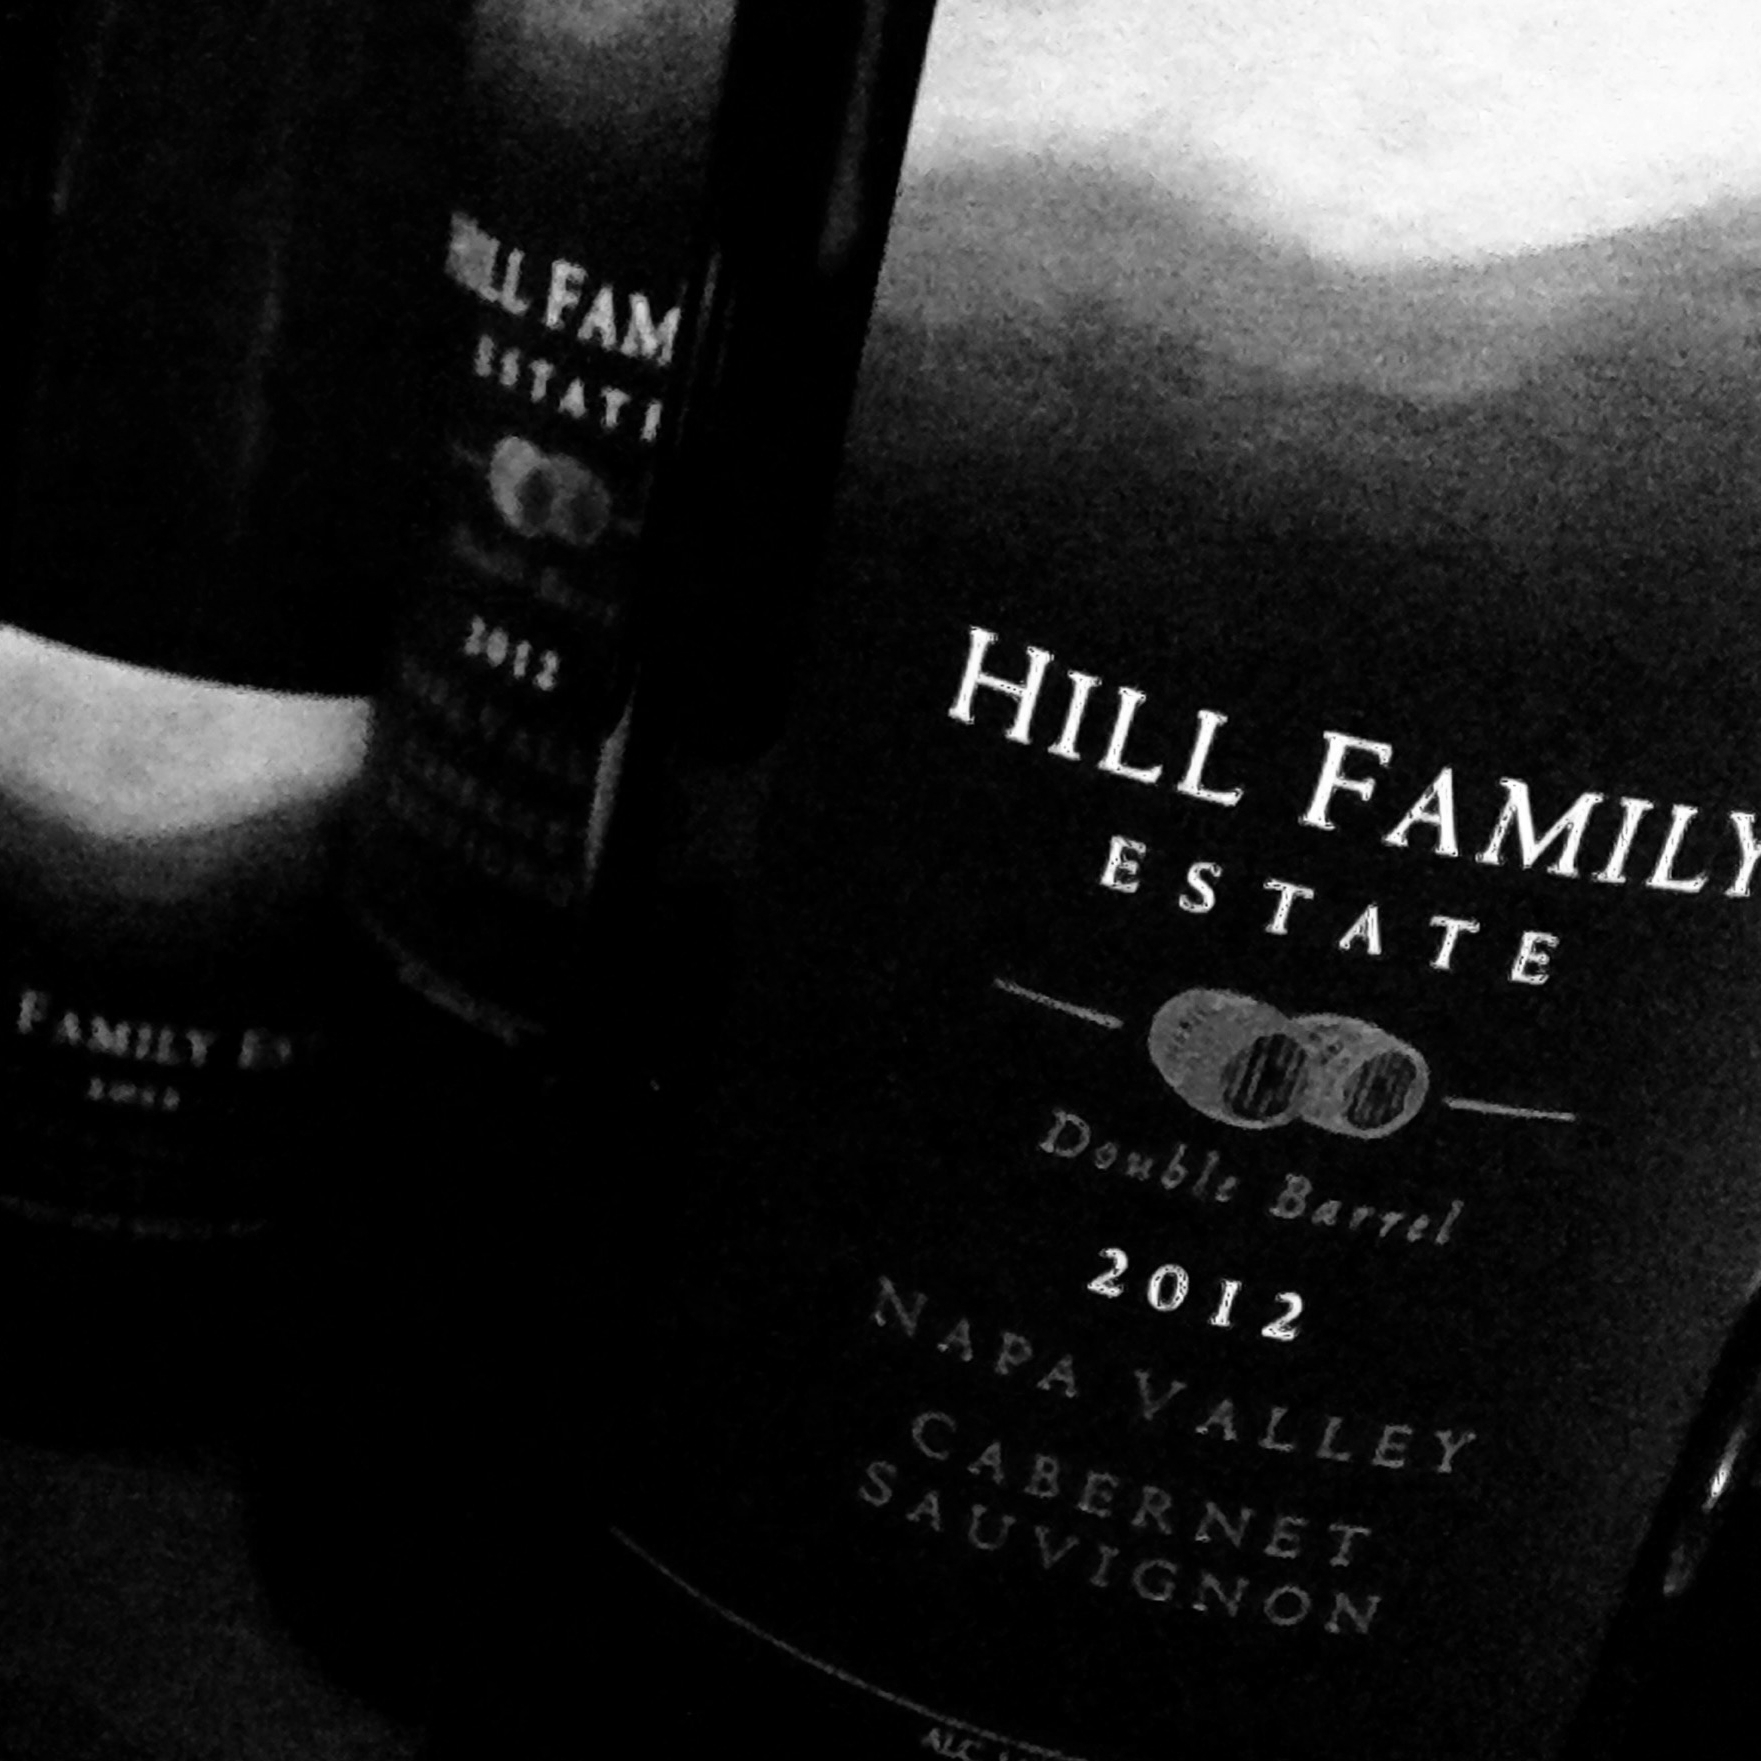 Hill Family Estate